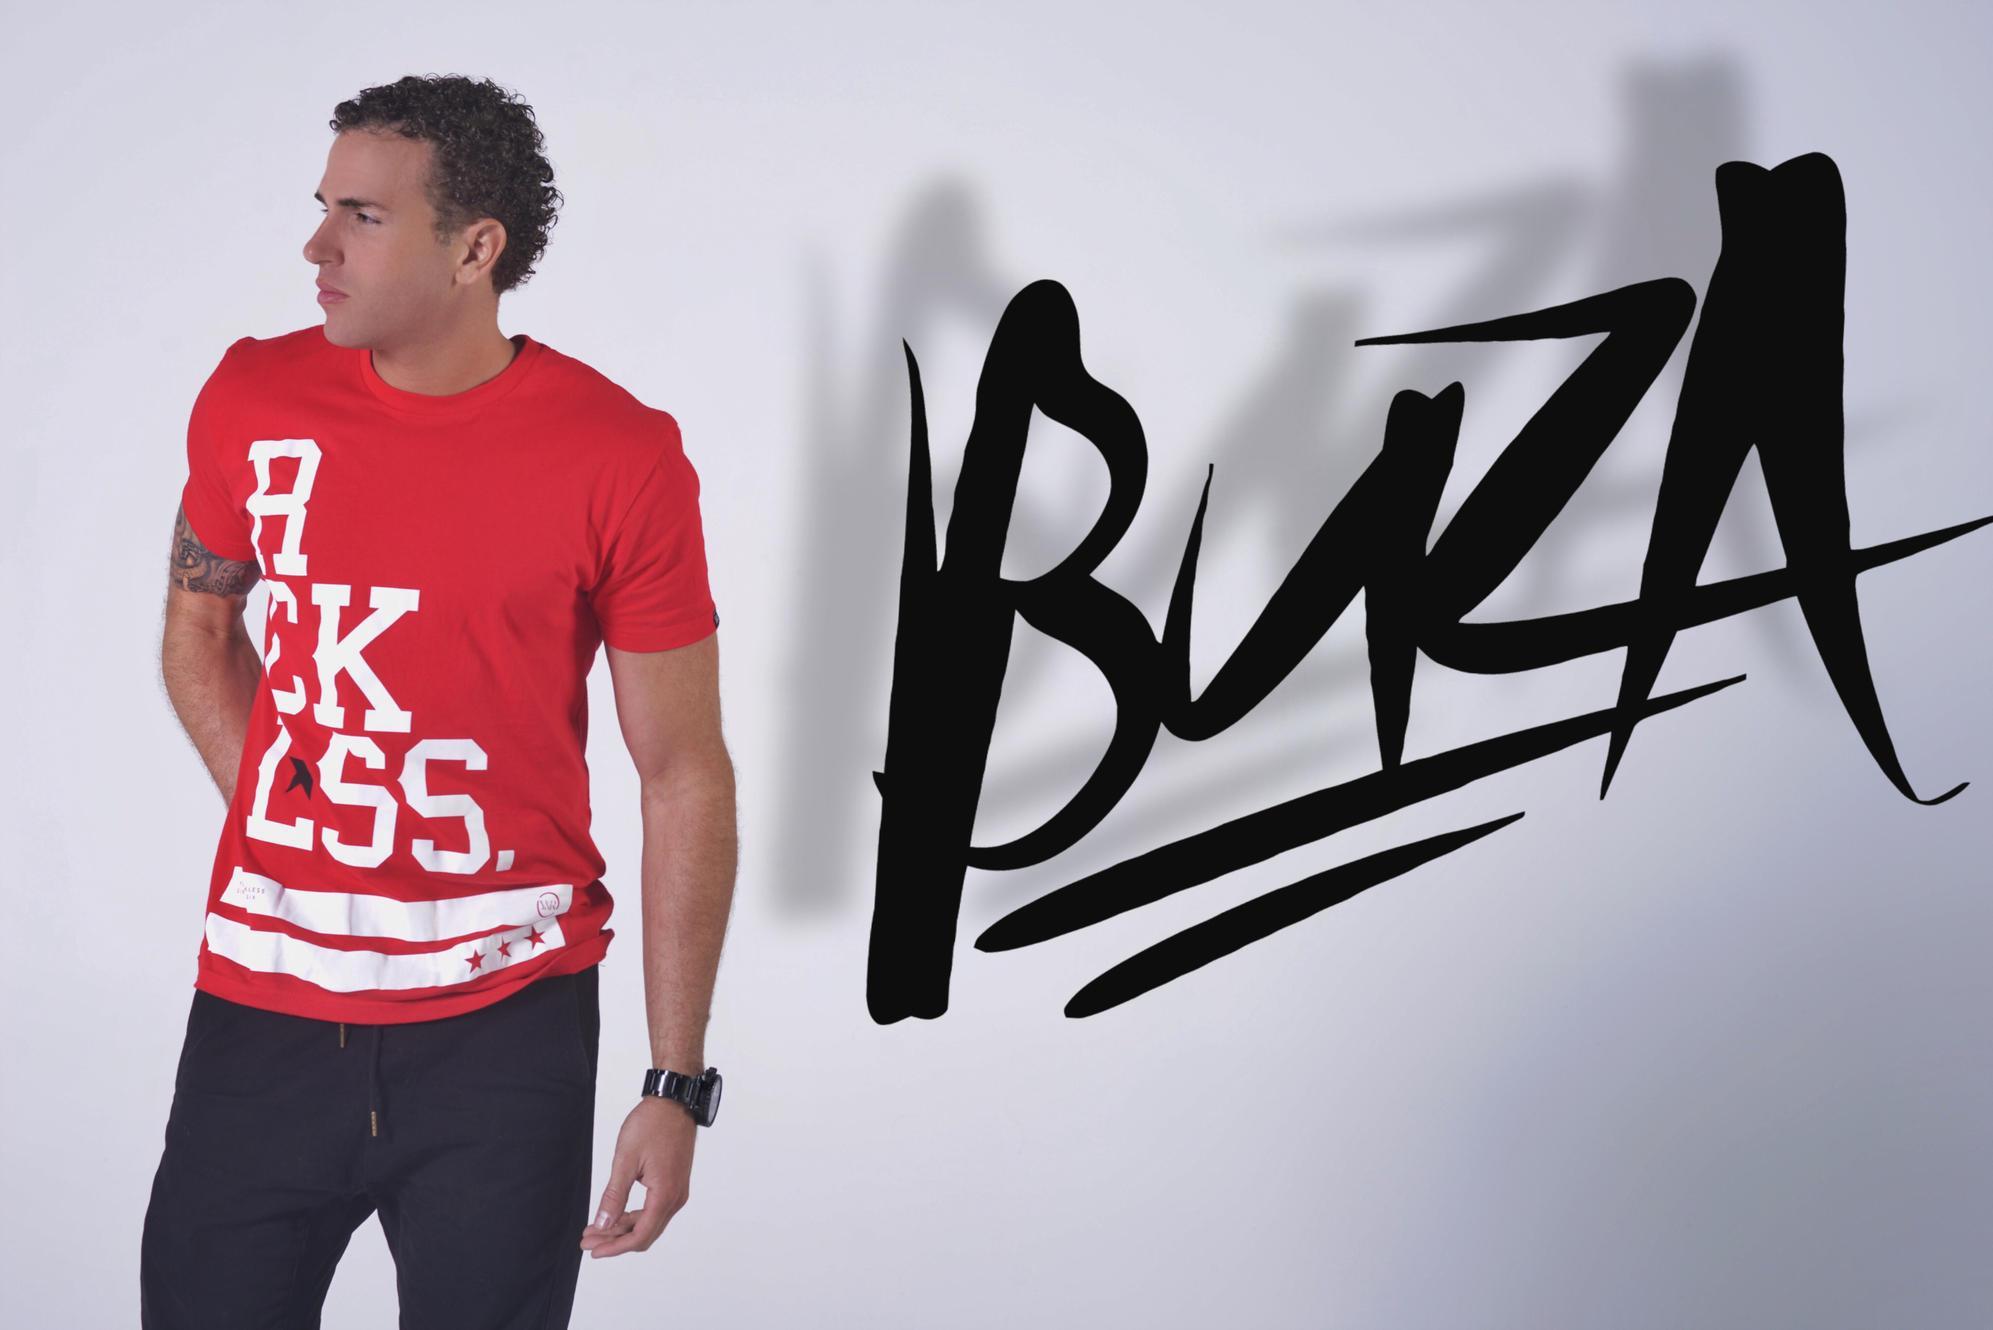 DJ BUZA Party Crawl